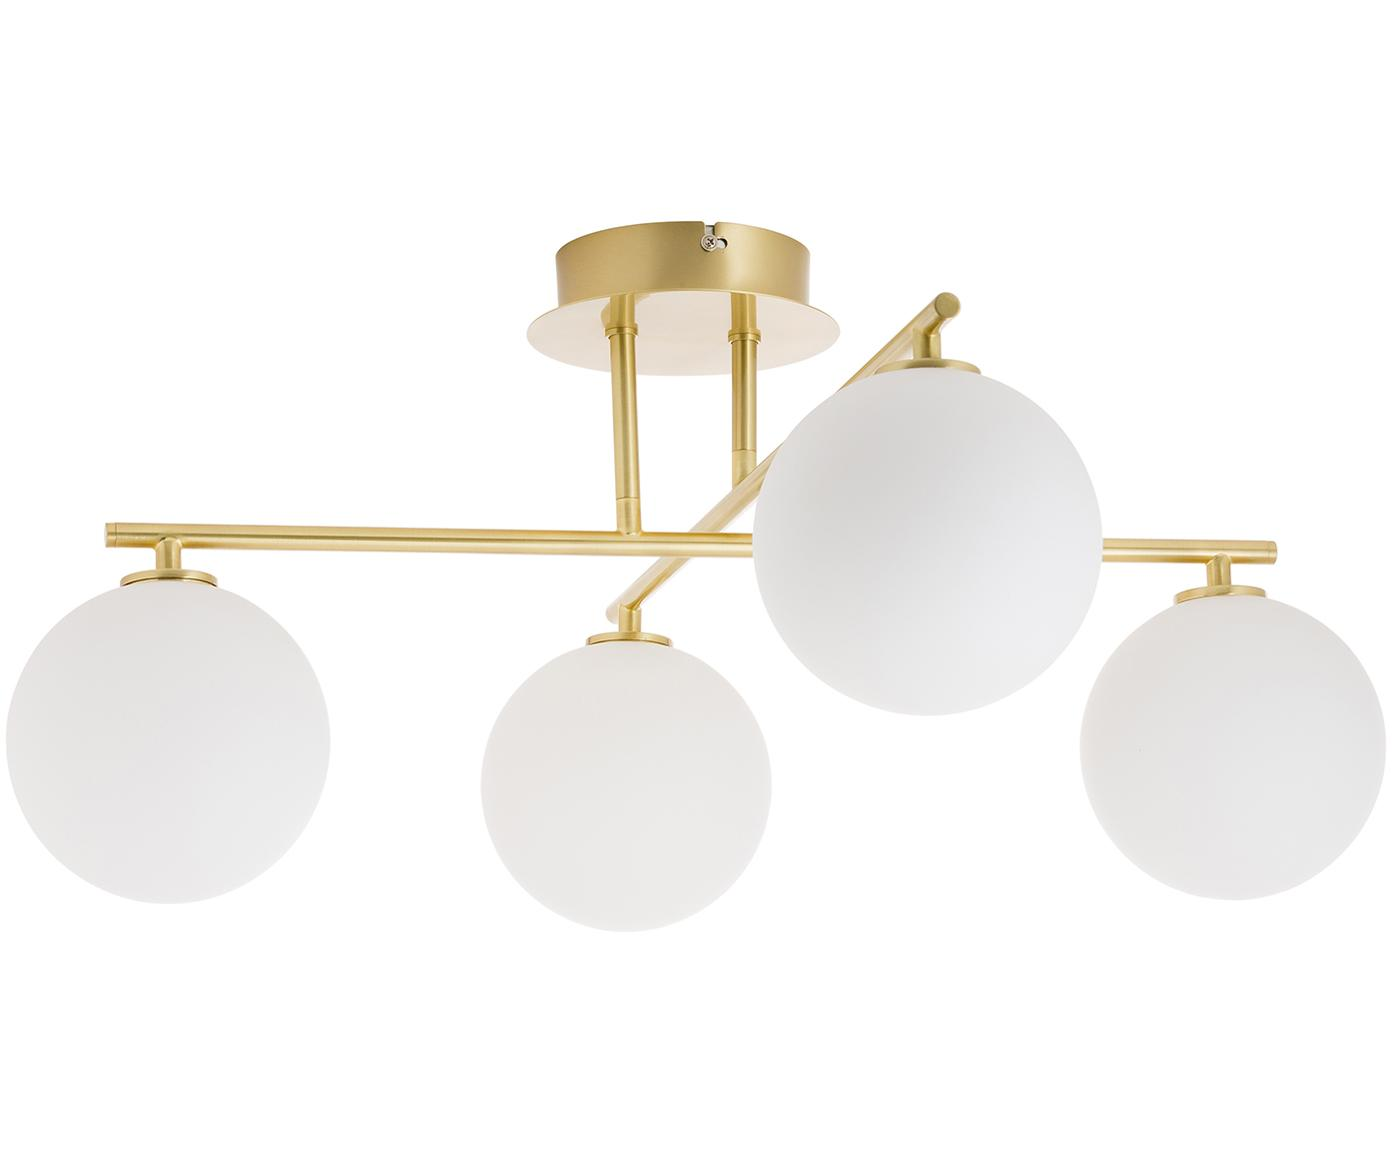 Plafón Atlanta, ajustable, Anclaje: metal latón, Blanco, latón, An 65 x Al 30 cm